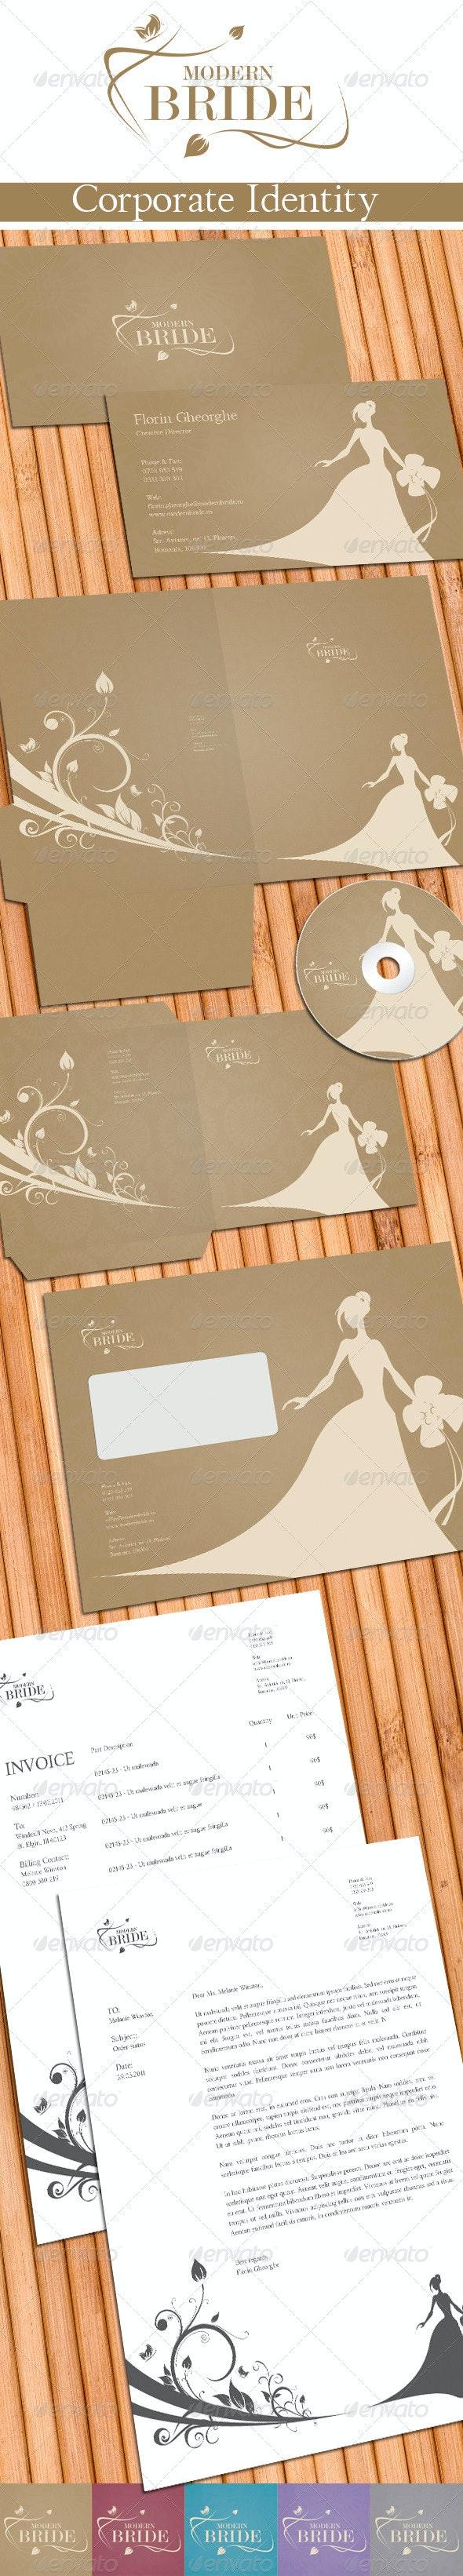 Modern Bride Corporate Identity - Stationery Print Templates